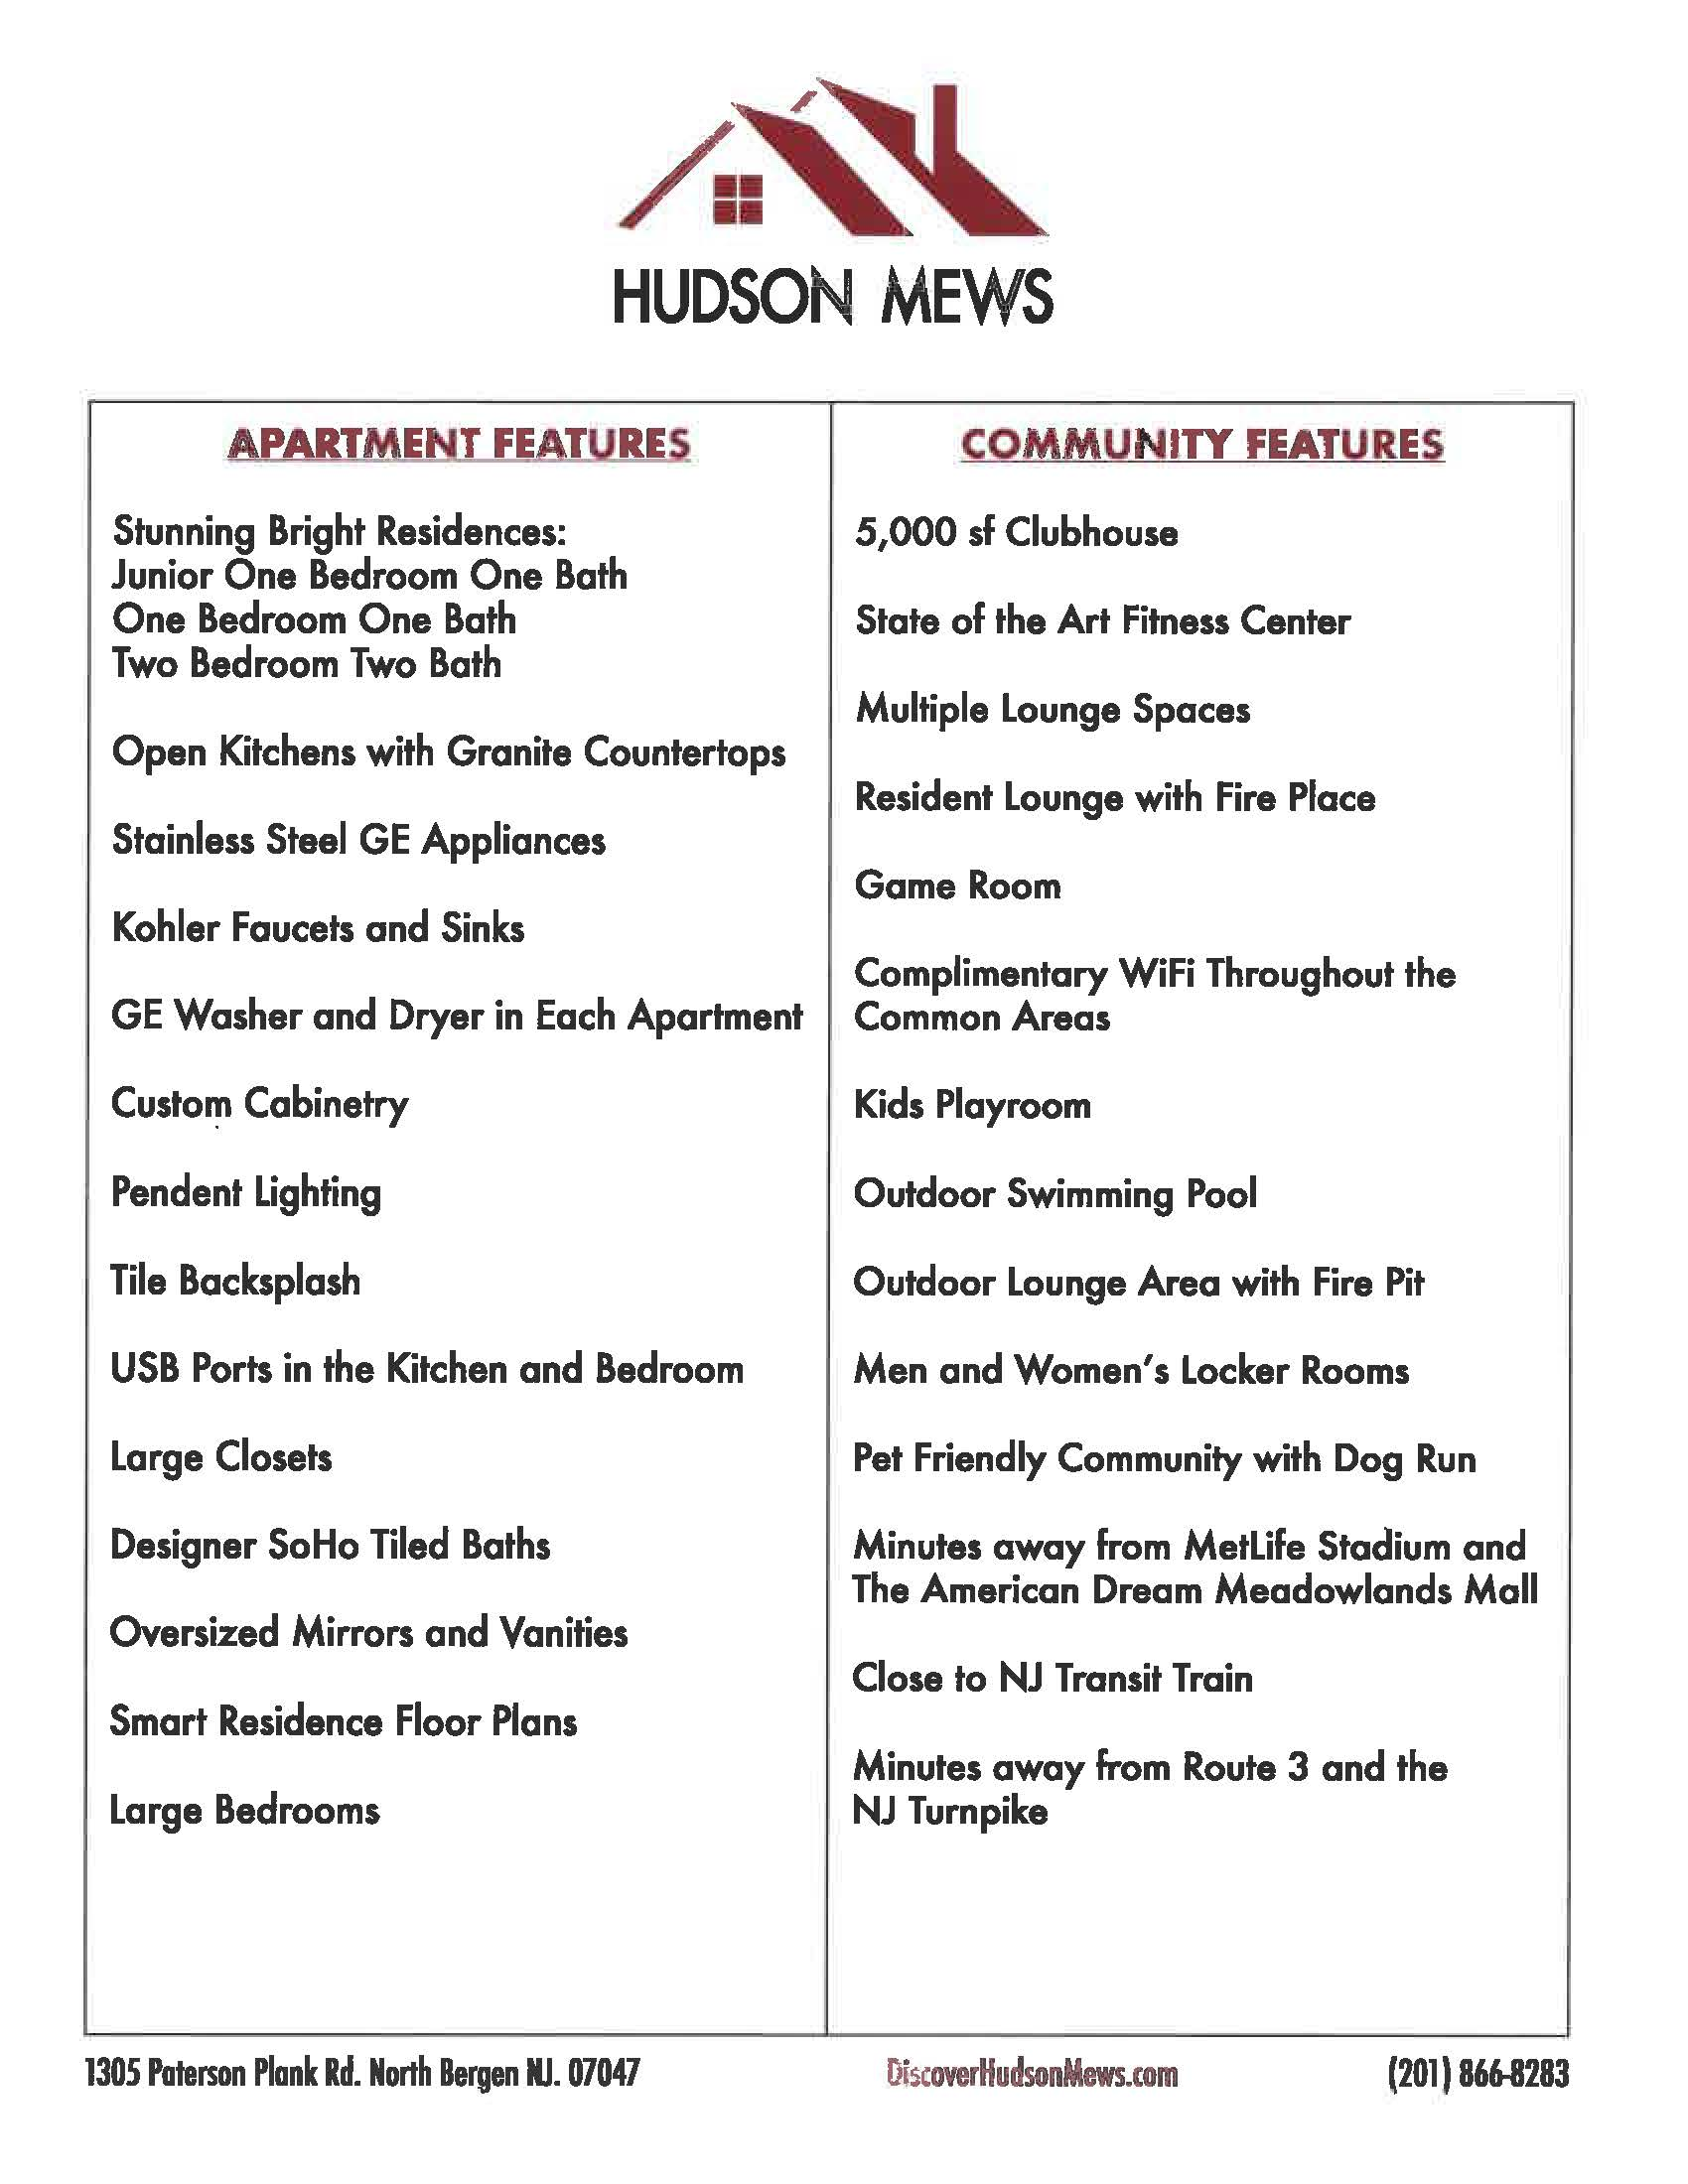 Hudson Mews Features1.jpg